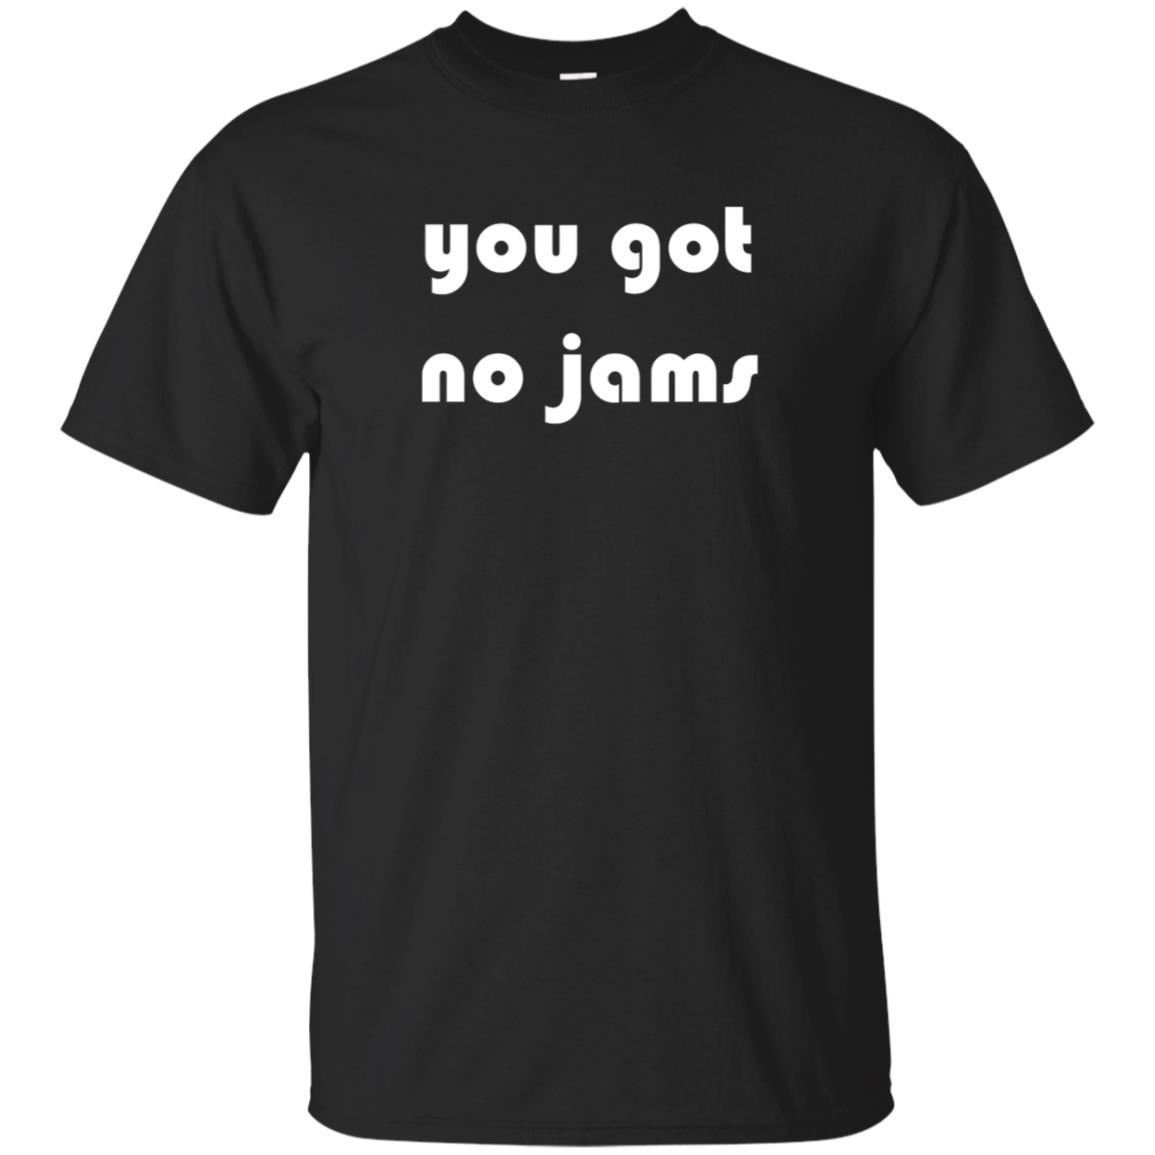 You Got No Jams kPop Fan Army Jimin Maknae Chimmy Unisex Short Sleeve